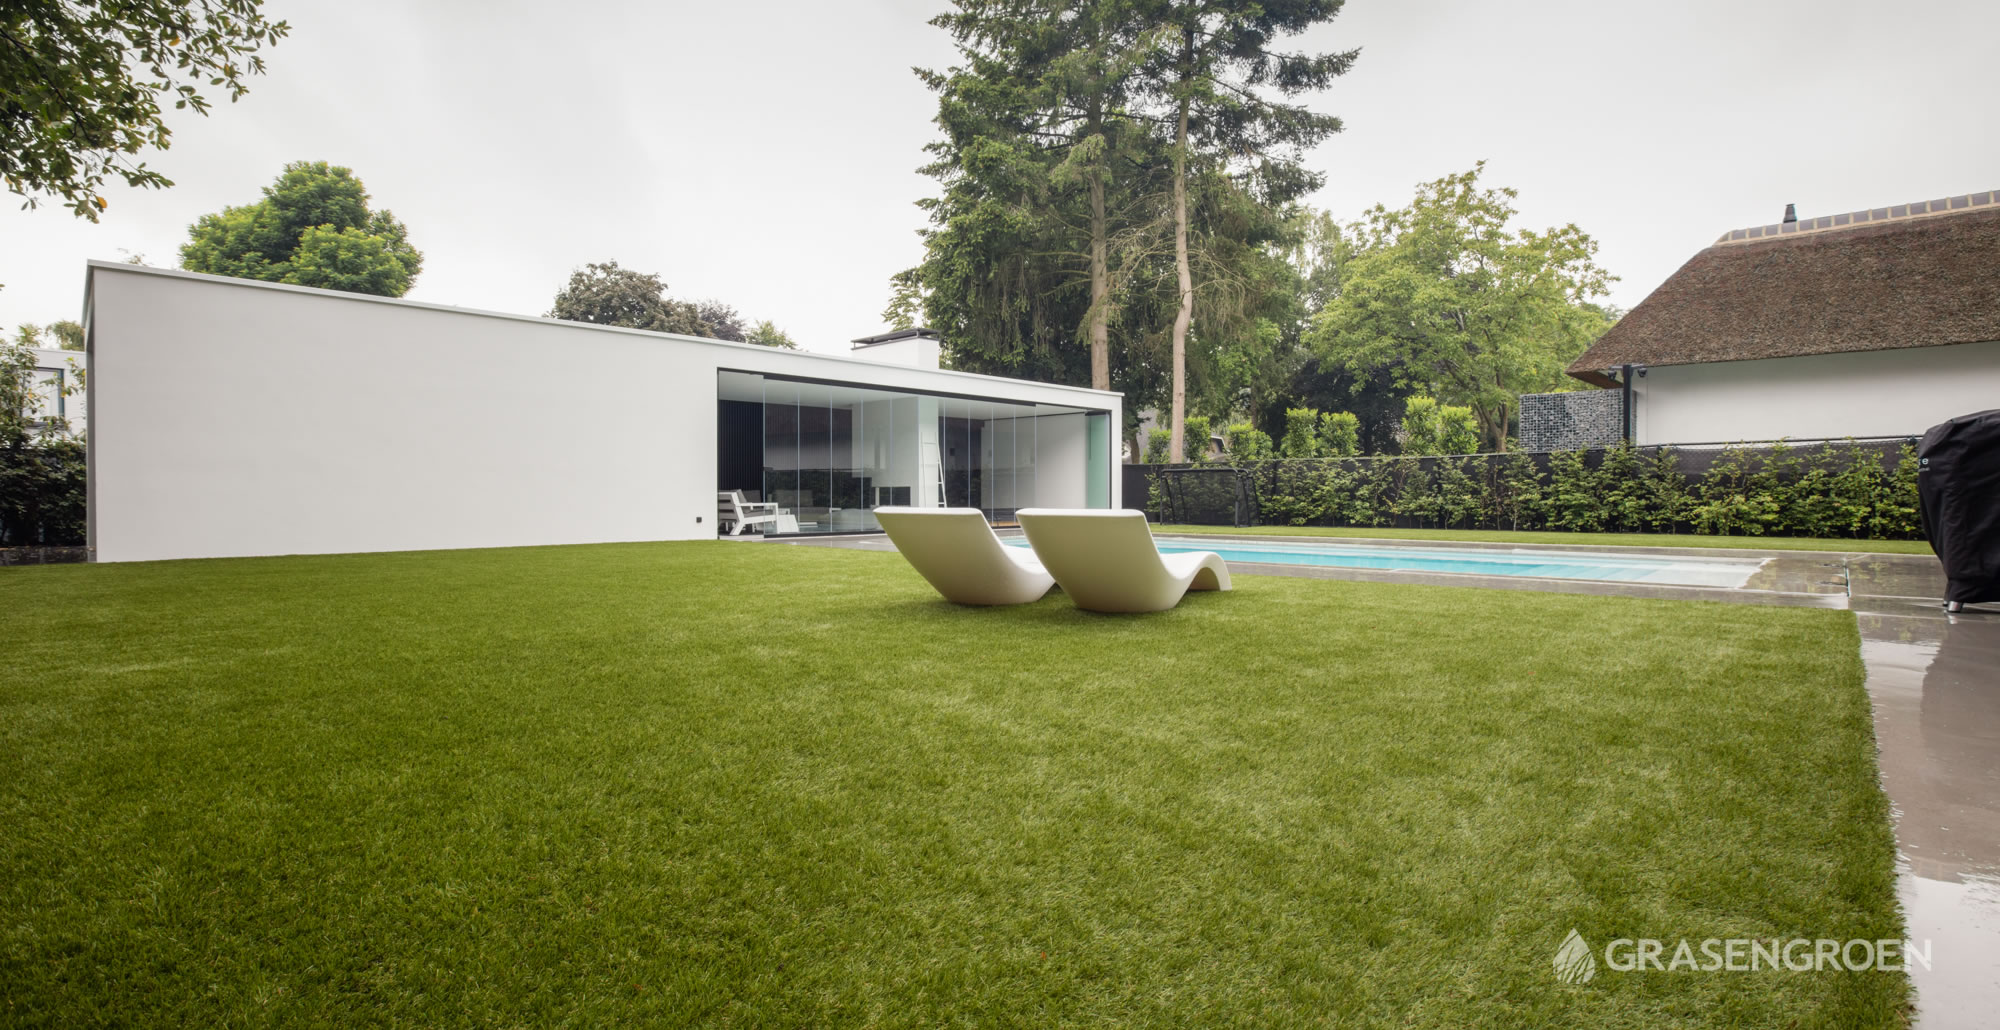 Kunstgrasleggenturnhout16 • Gras en Groen Kunstgras